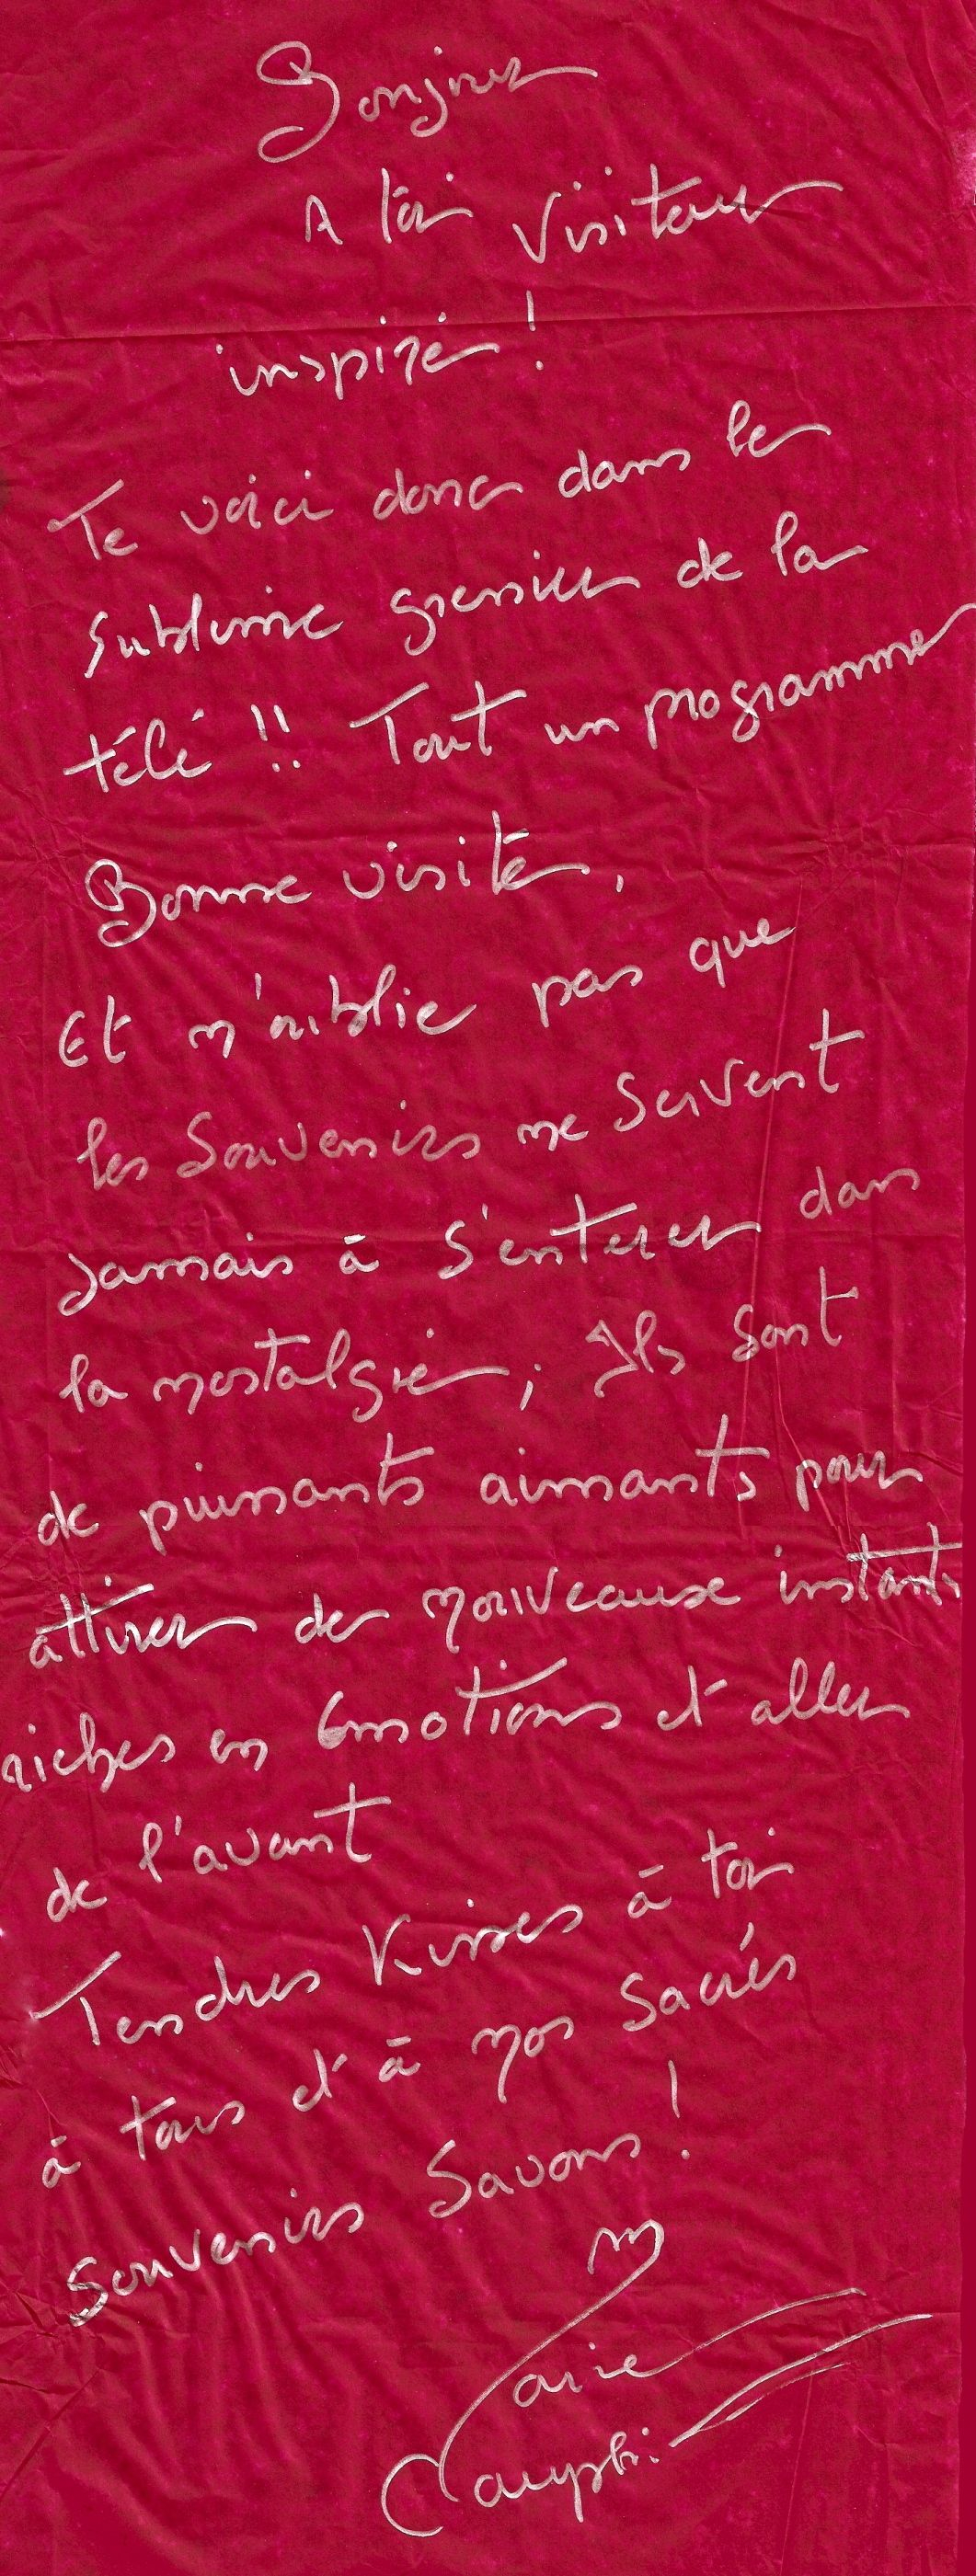 http://grenierdelatv.free.fr/mariedauphindedicacegrenier.jpg